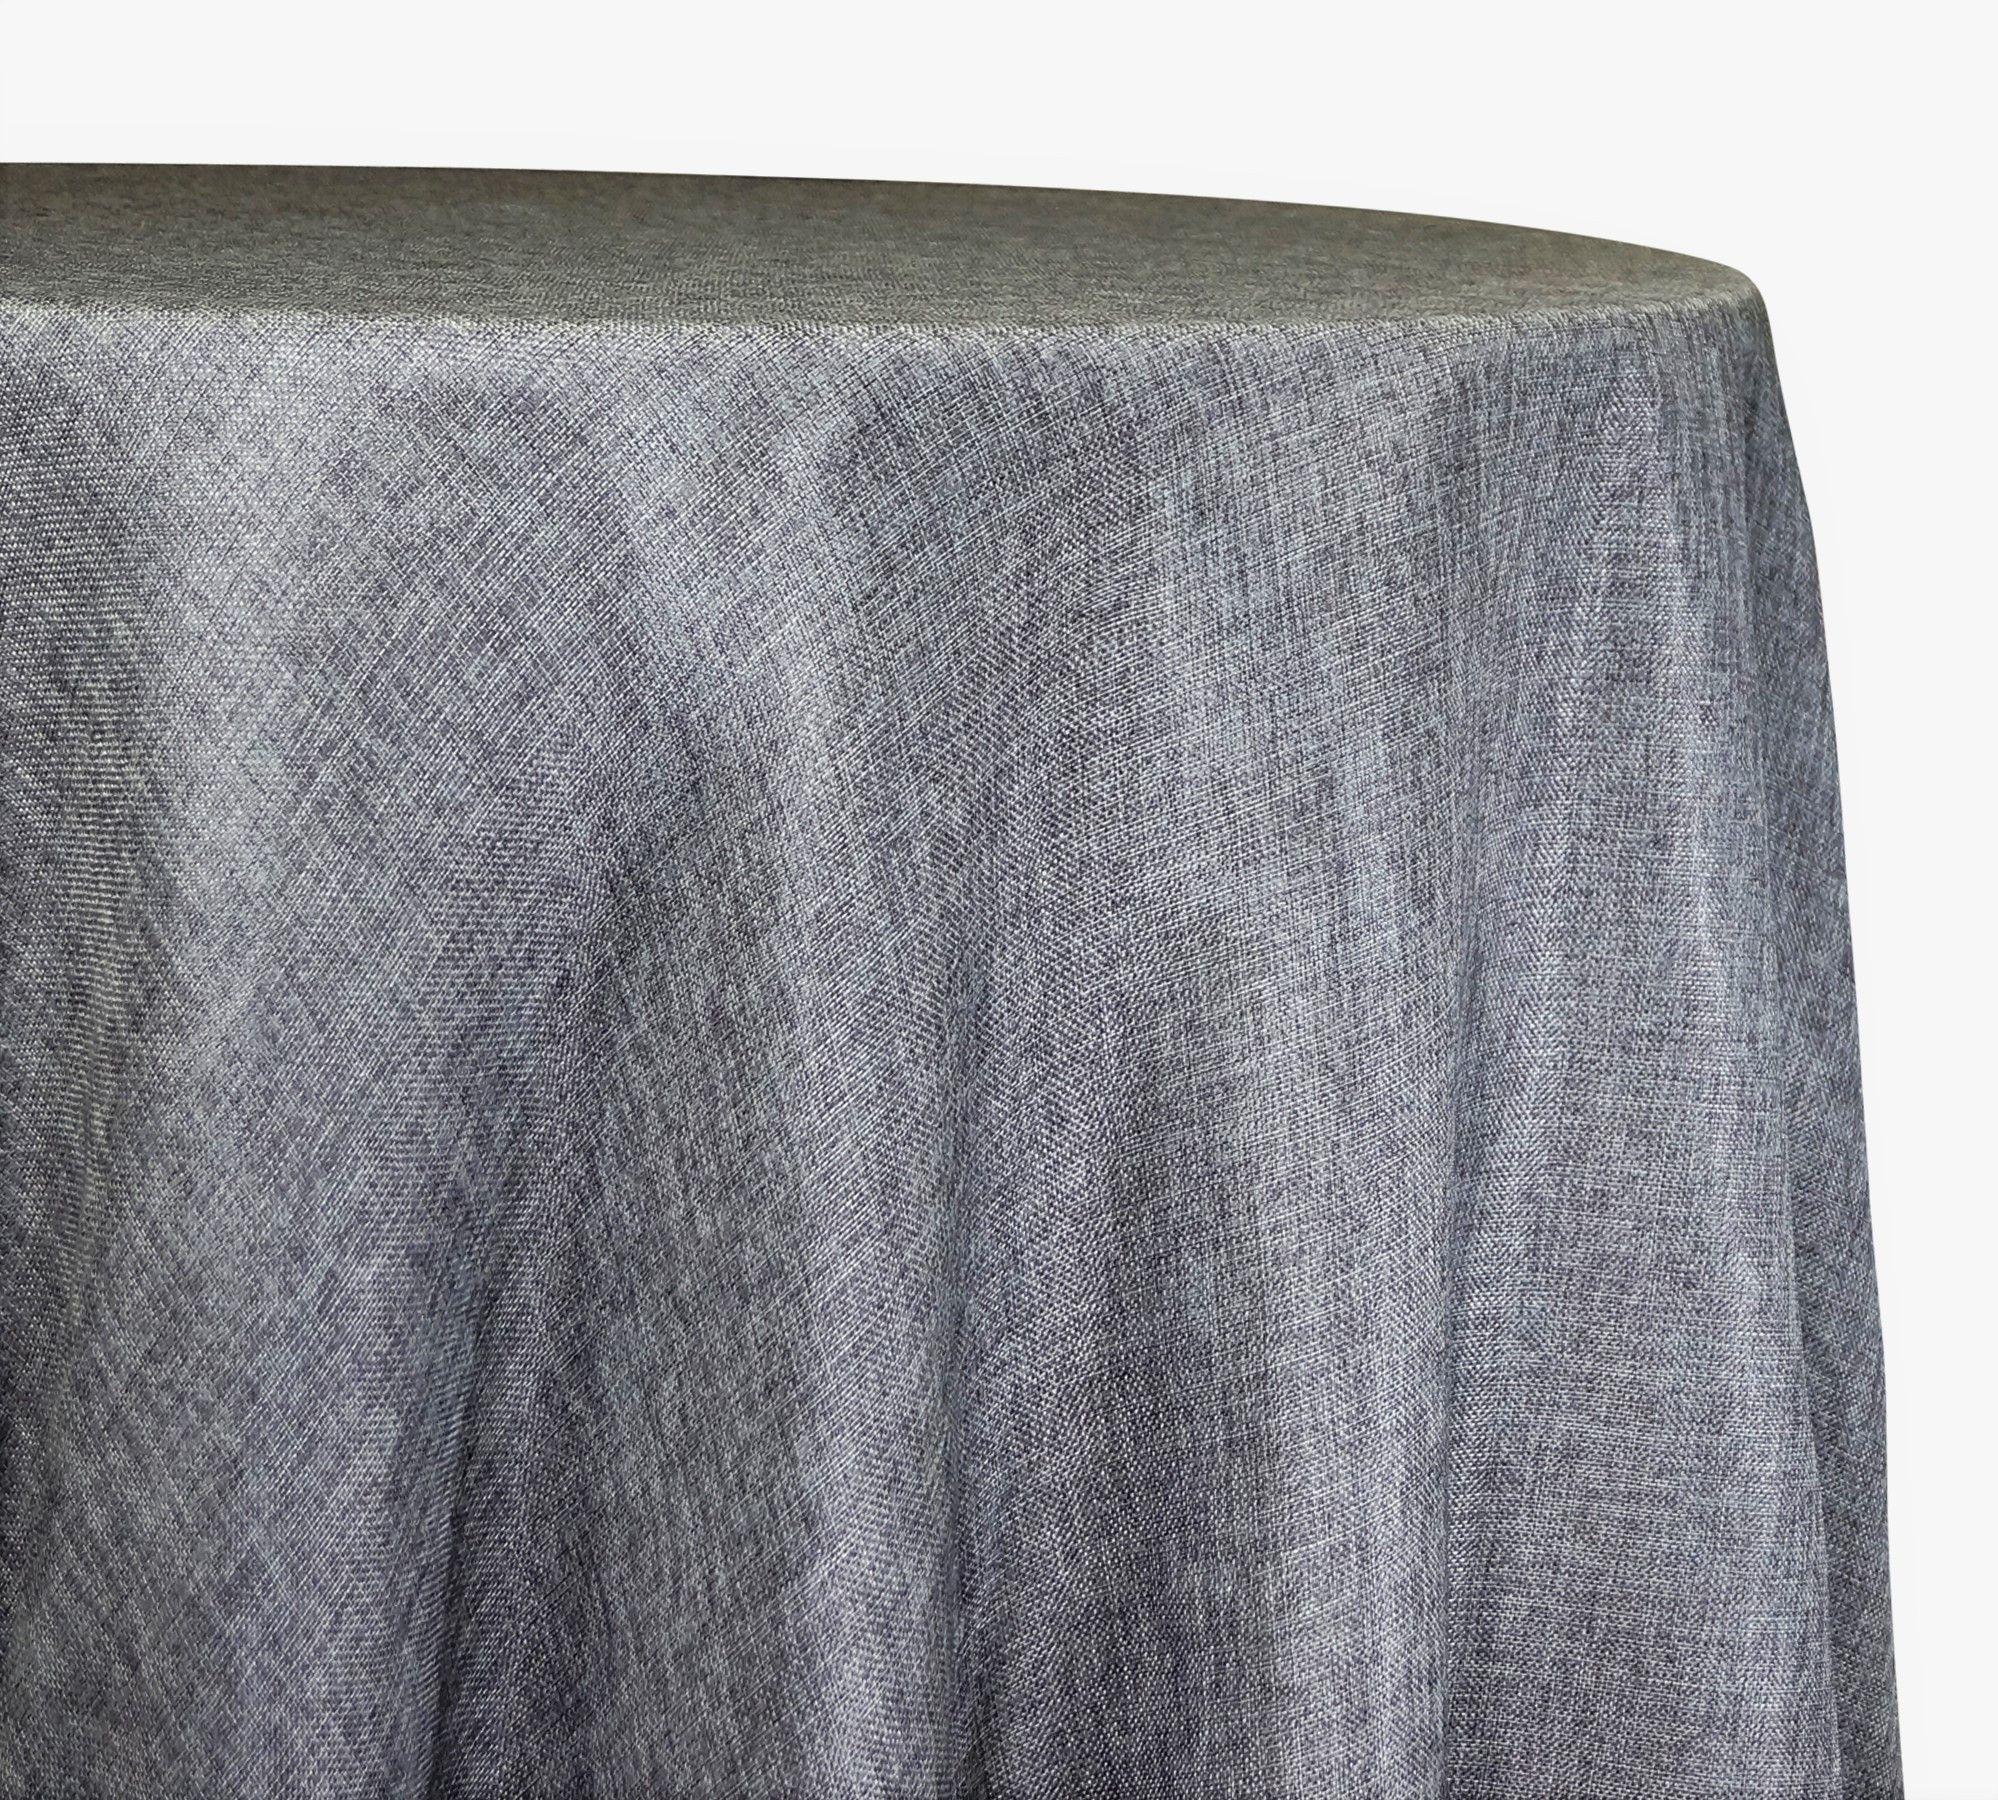 Imitation Burlap 100 Polyester Tablecloths Overlays Pink